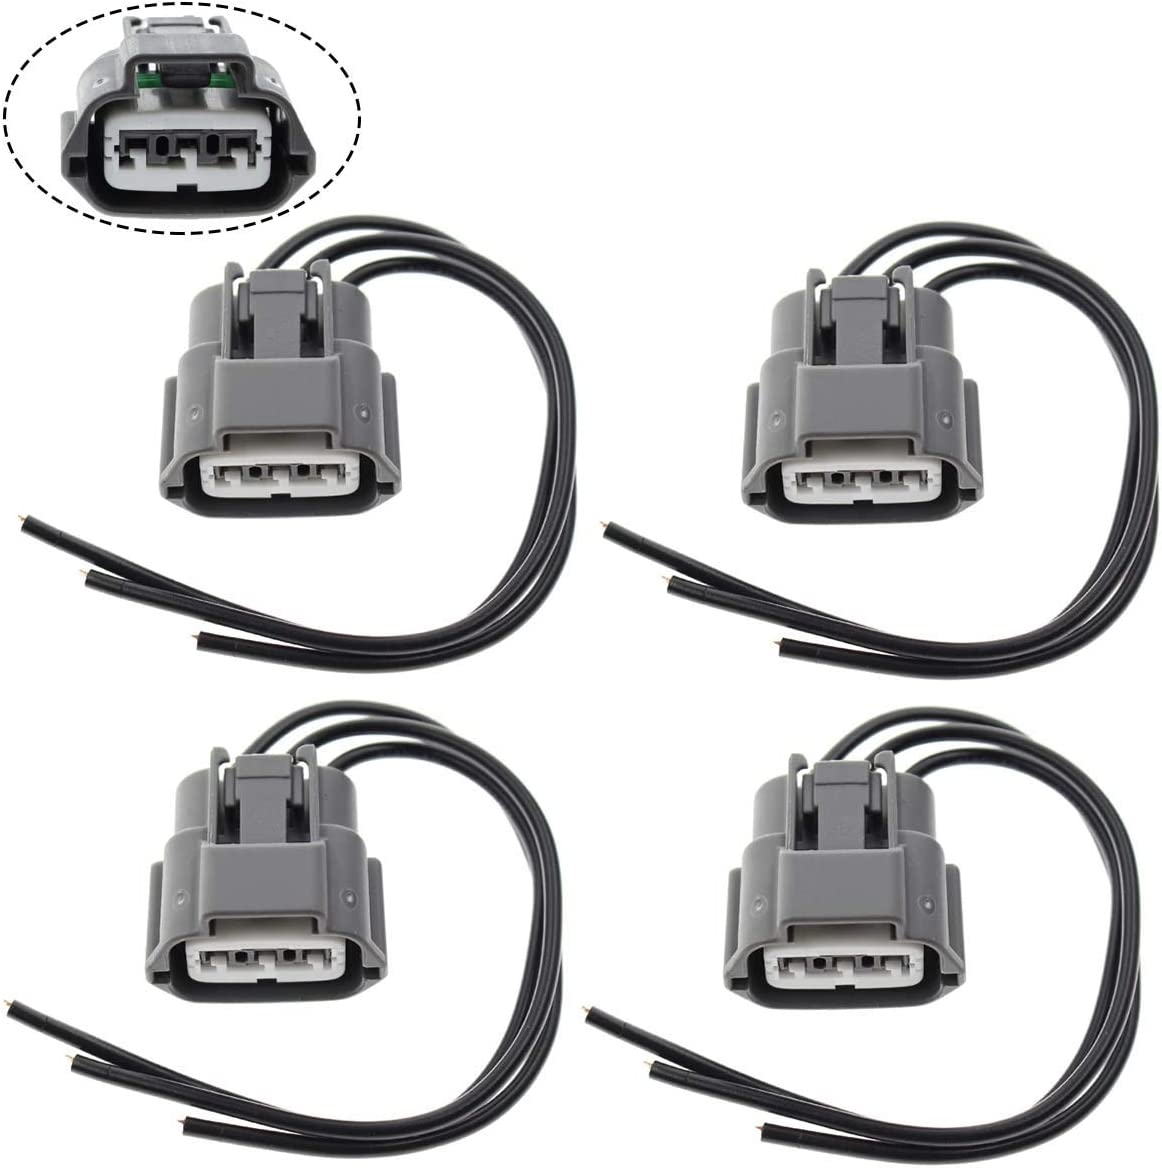 Chevy Ballast Resistor Wiring Diagram Also Ford Tps Sensor Wiring